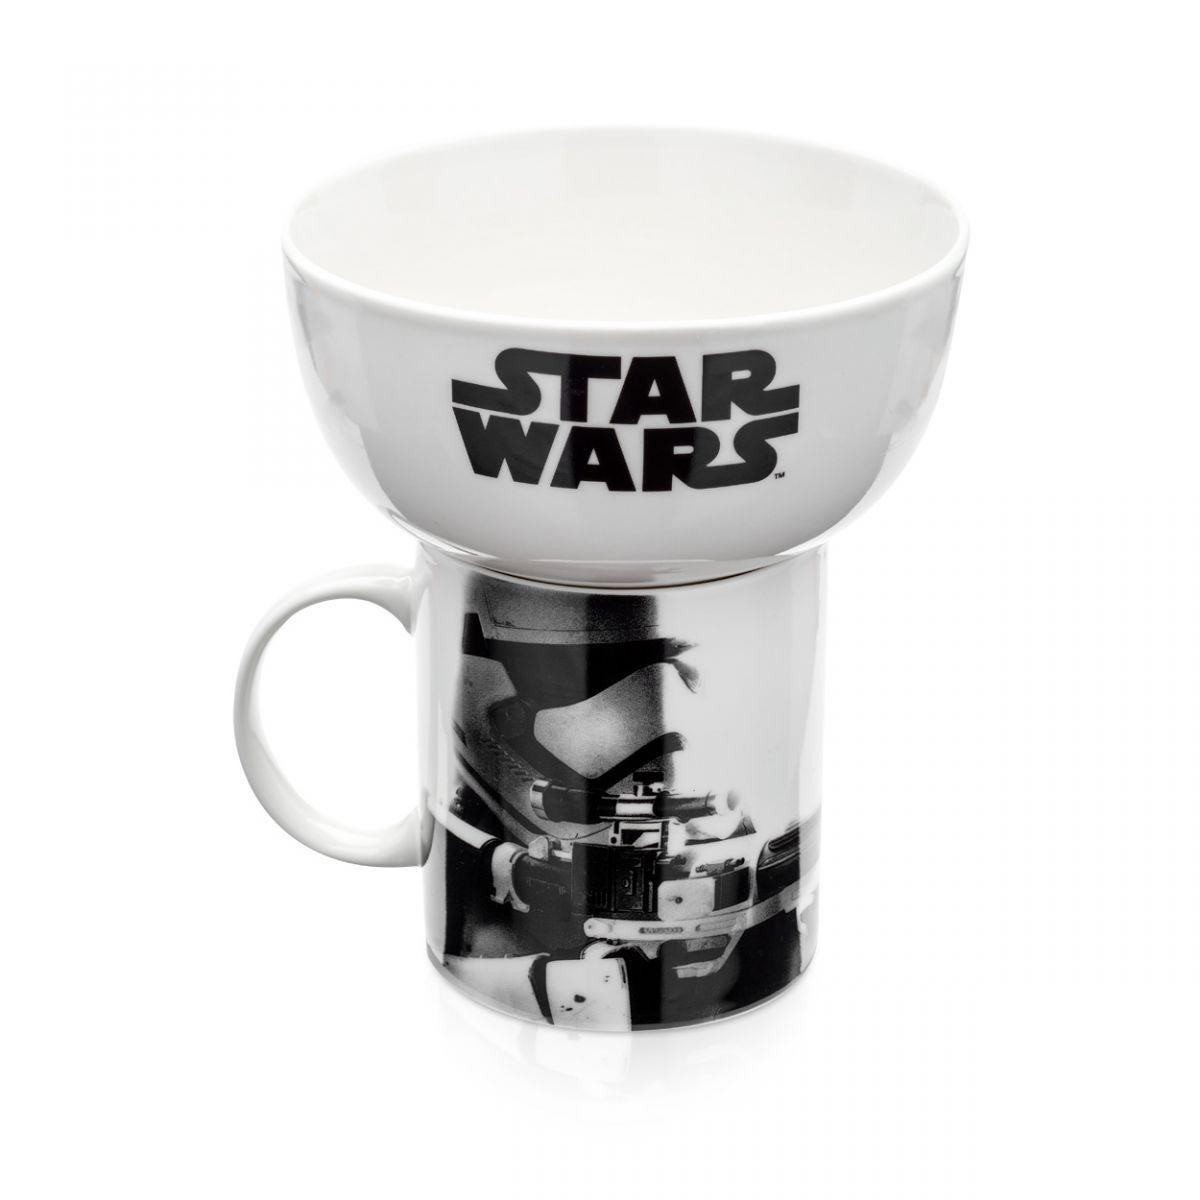 Stormtrooper - Kit Caneca e Tigela Star Wars